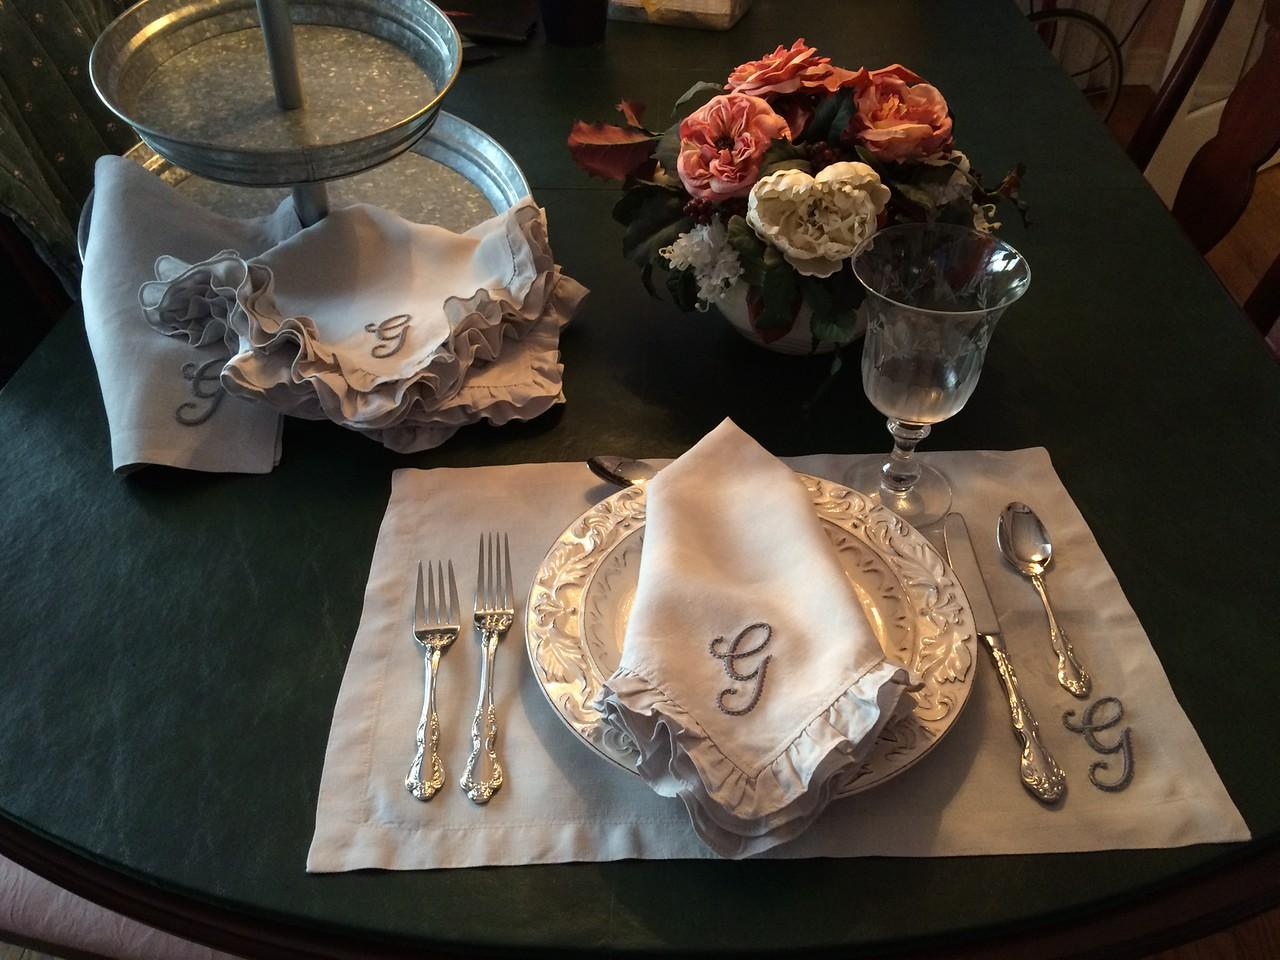 Ruffled linen napkins & placemats